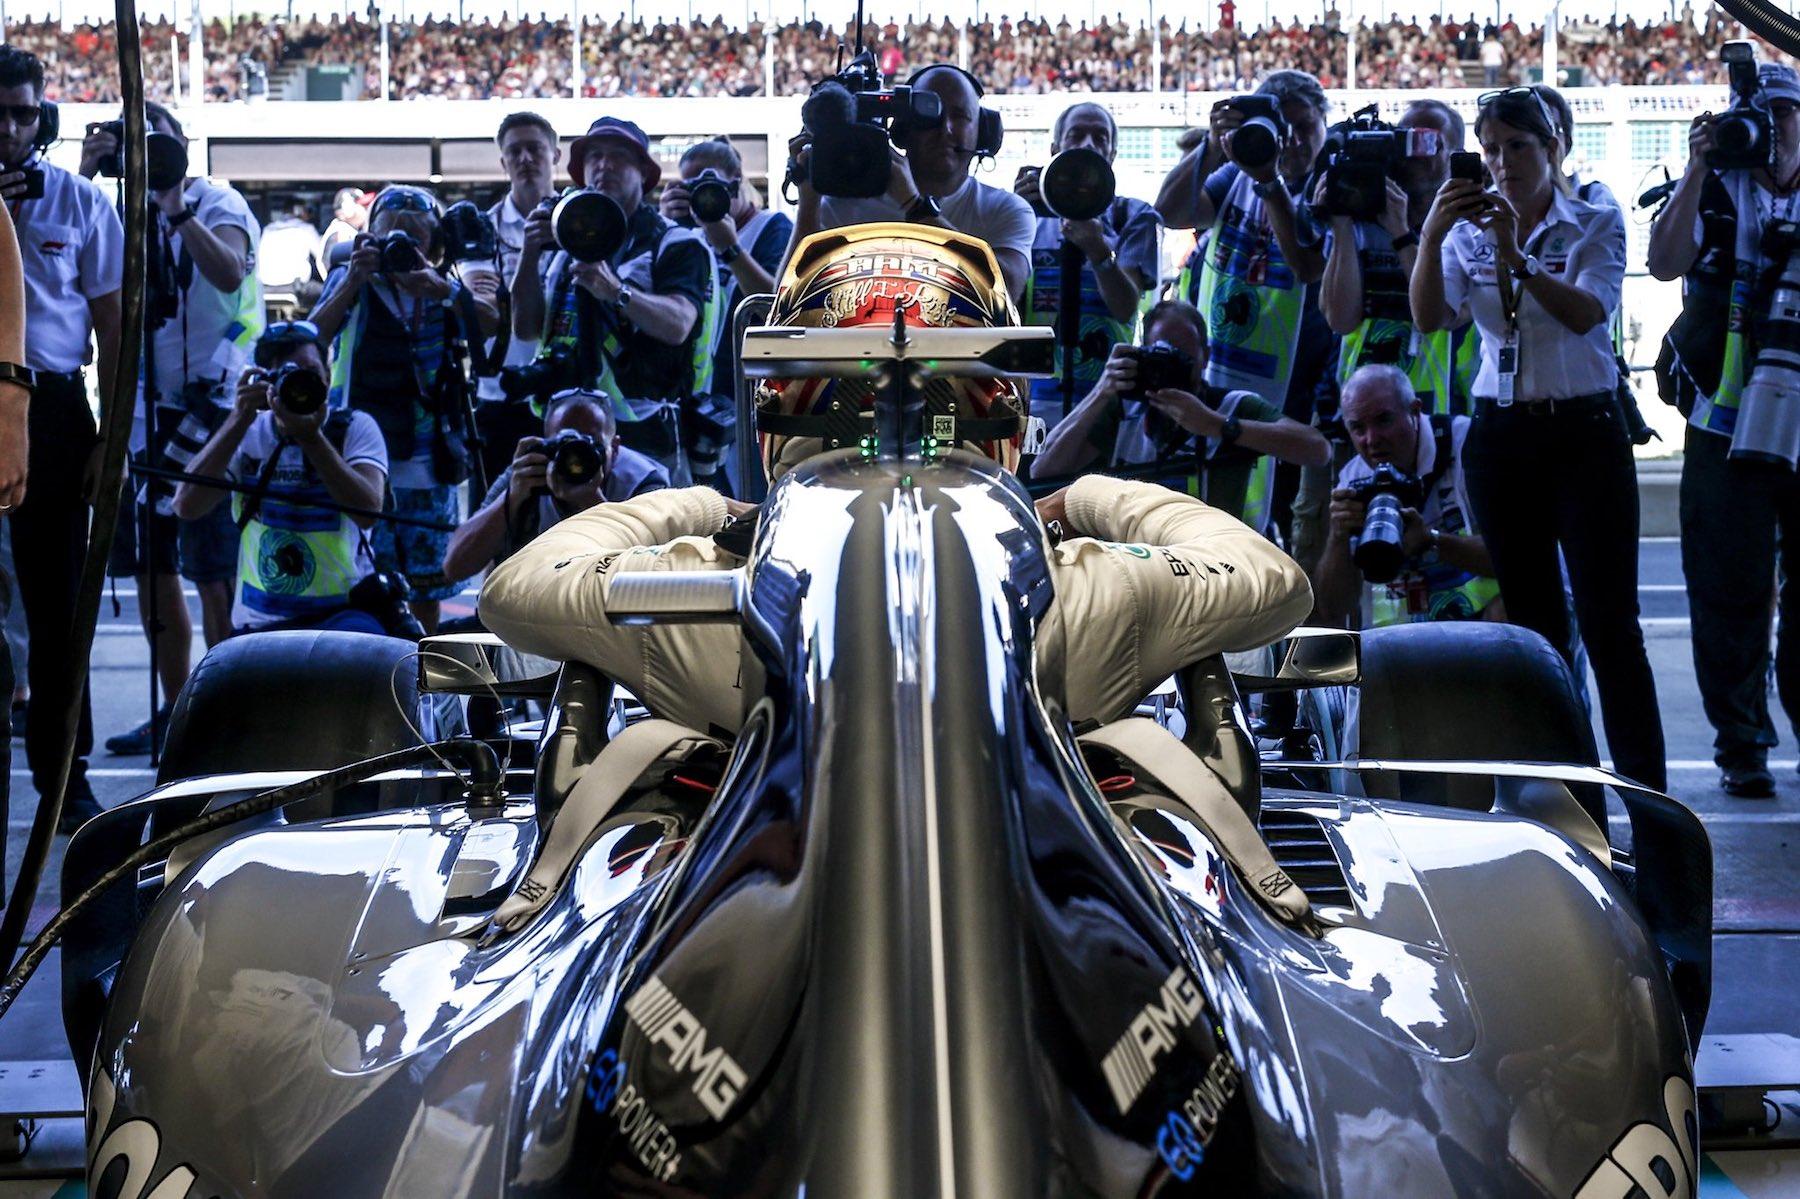 1 2018 Lewis Hamilton | Mercedes W09 | 2018 British GP Q1 1 copy.jpg